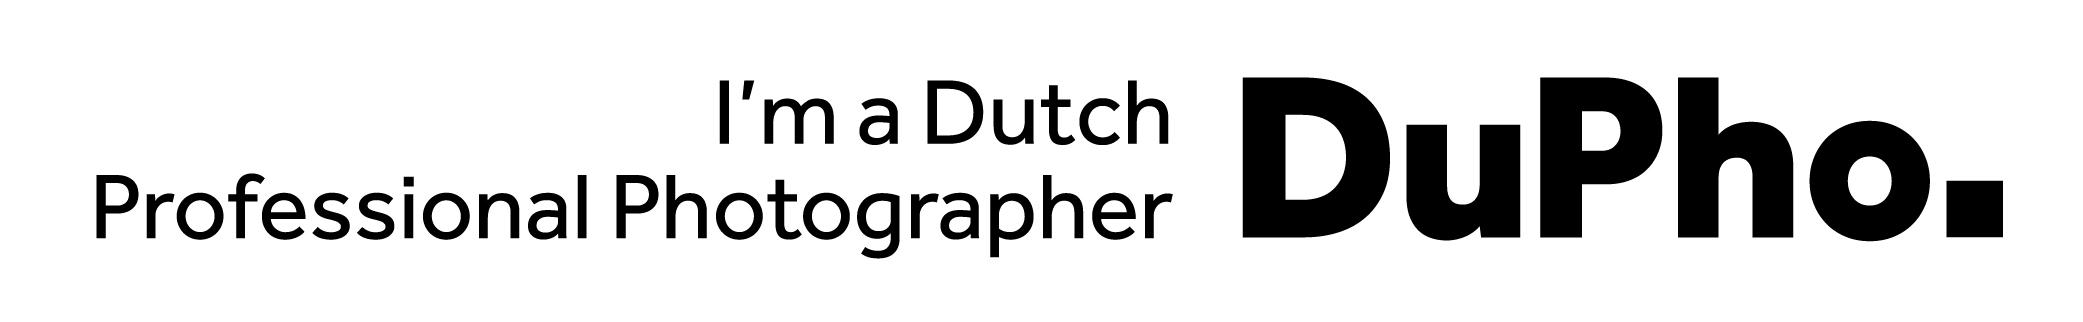 DuPho fotograaf